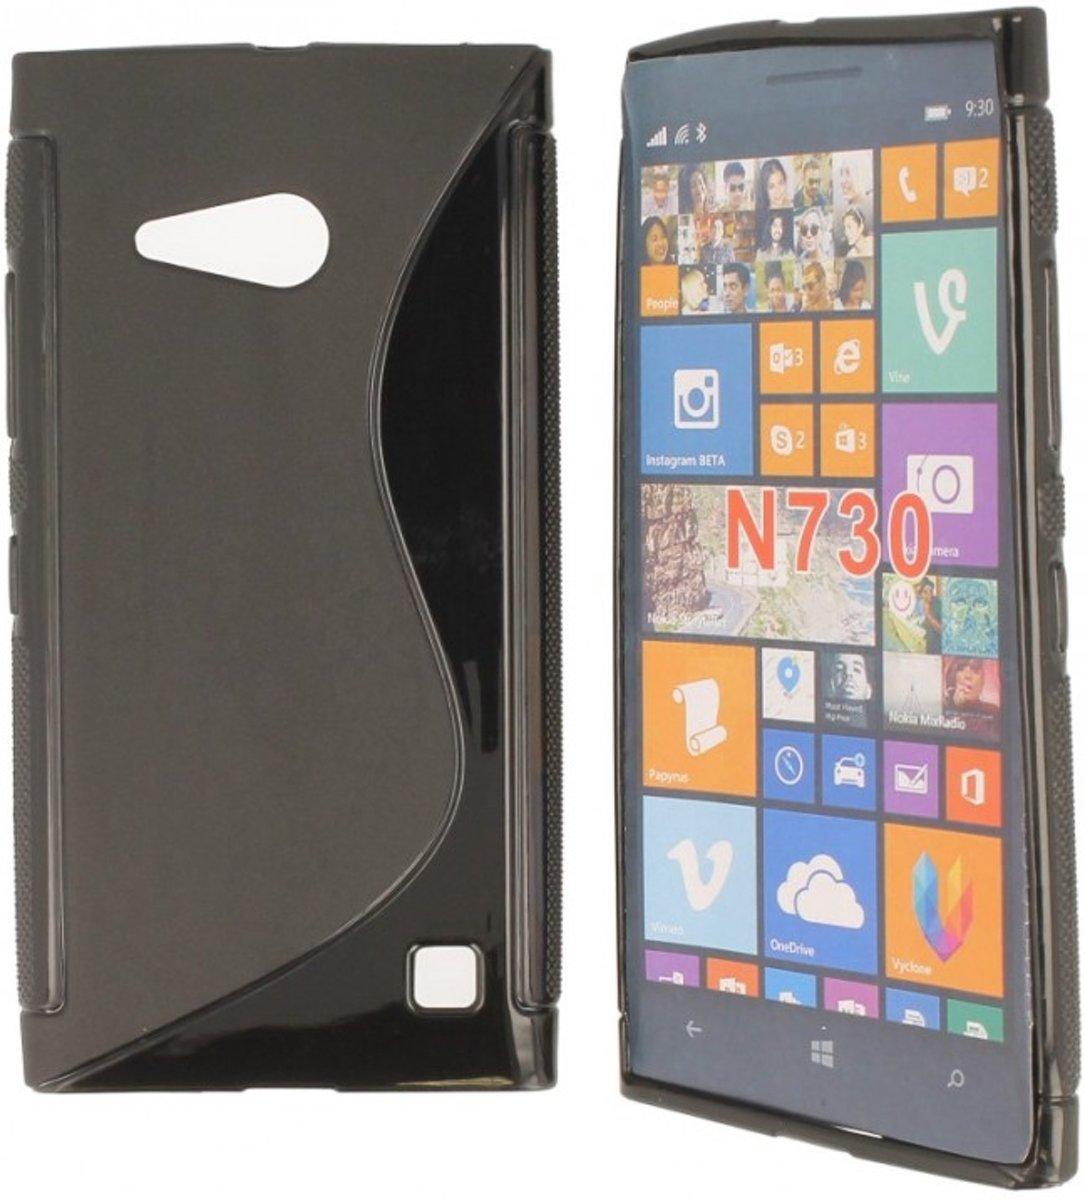 Image of Nokia Lumia 730 Dual Sim Silicon Hoesje - S-Line Black (8719321207457)